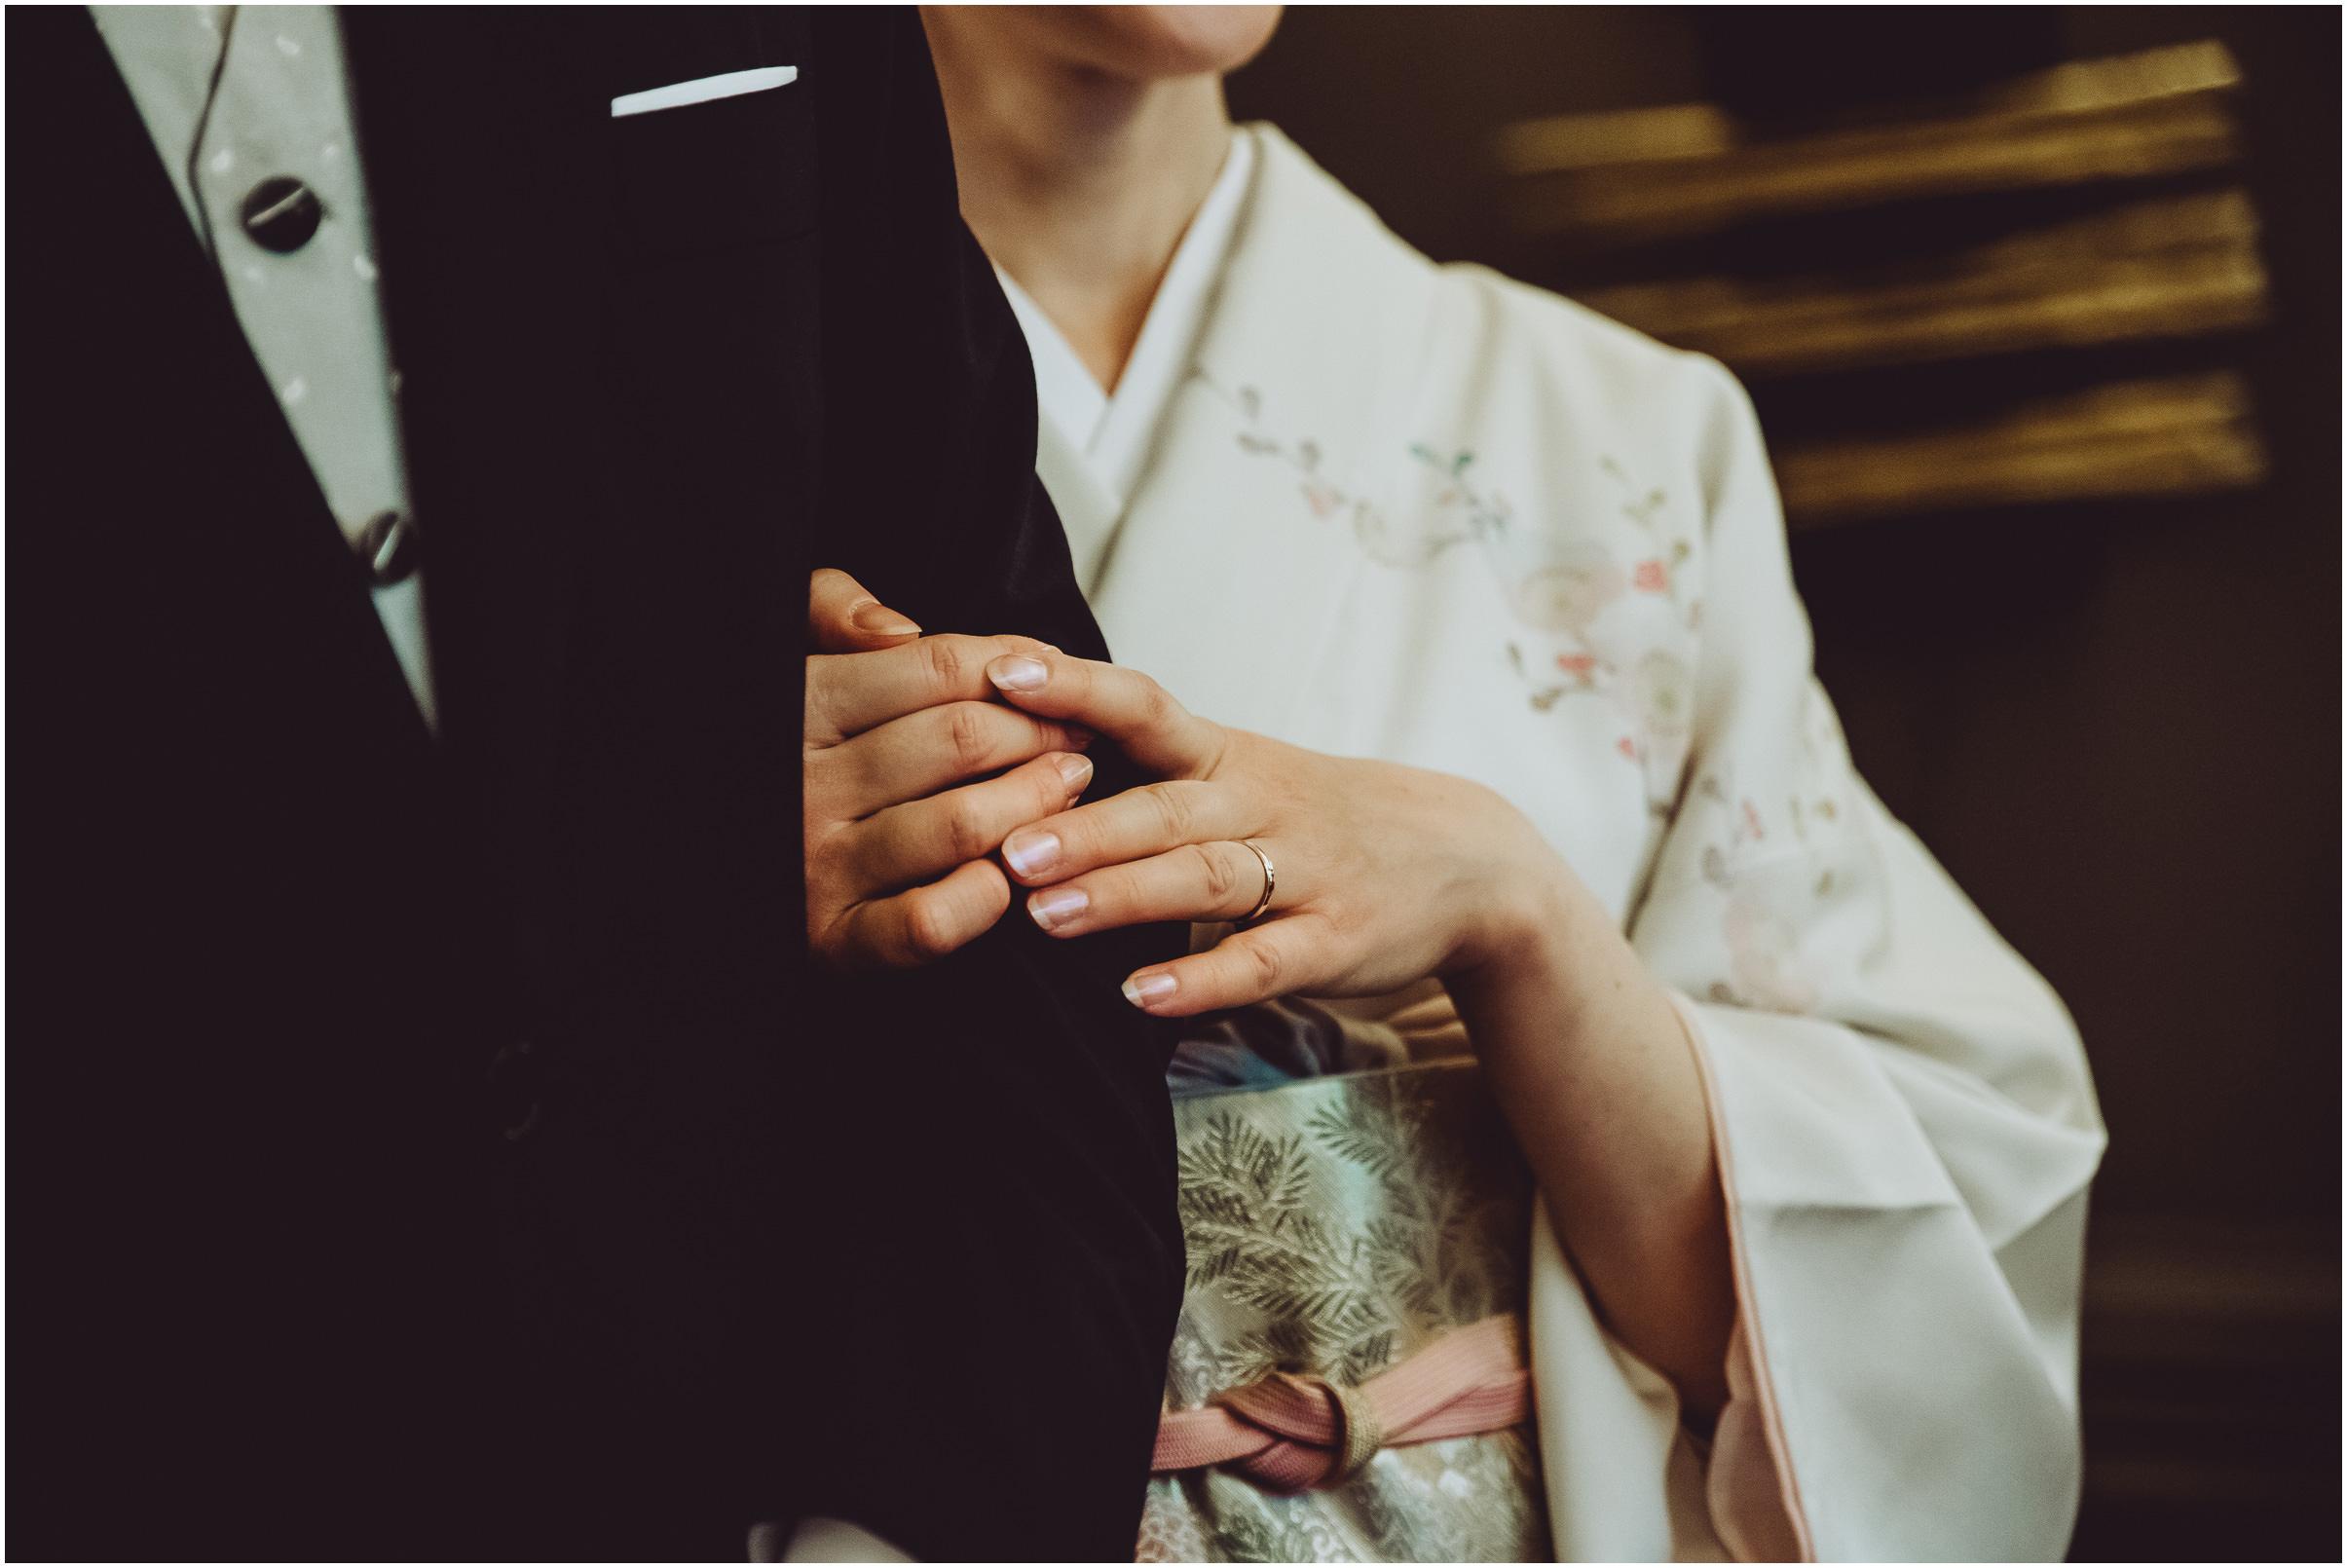 WEDDING-PHOTOGRAPHY-SARA-LORENZONI-FOTOGRAFIA-MATRIMONIO-ORVIETO-JUKA-ANTONELLO62